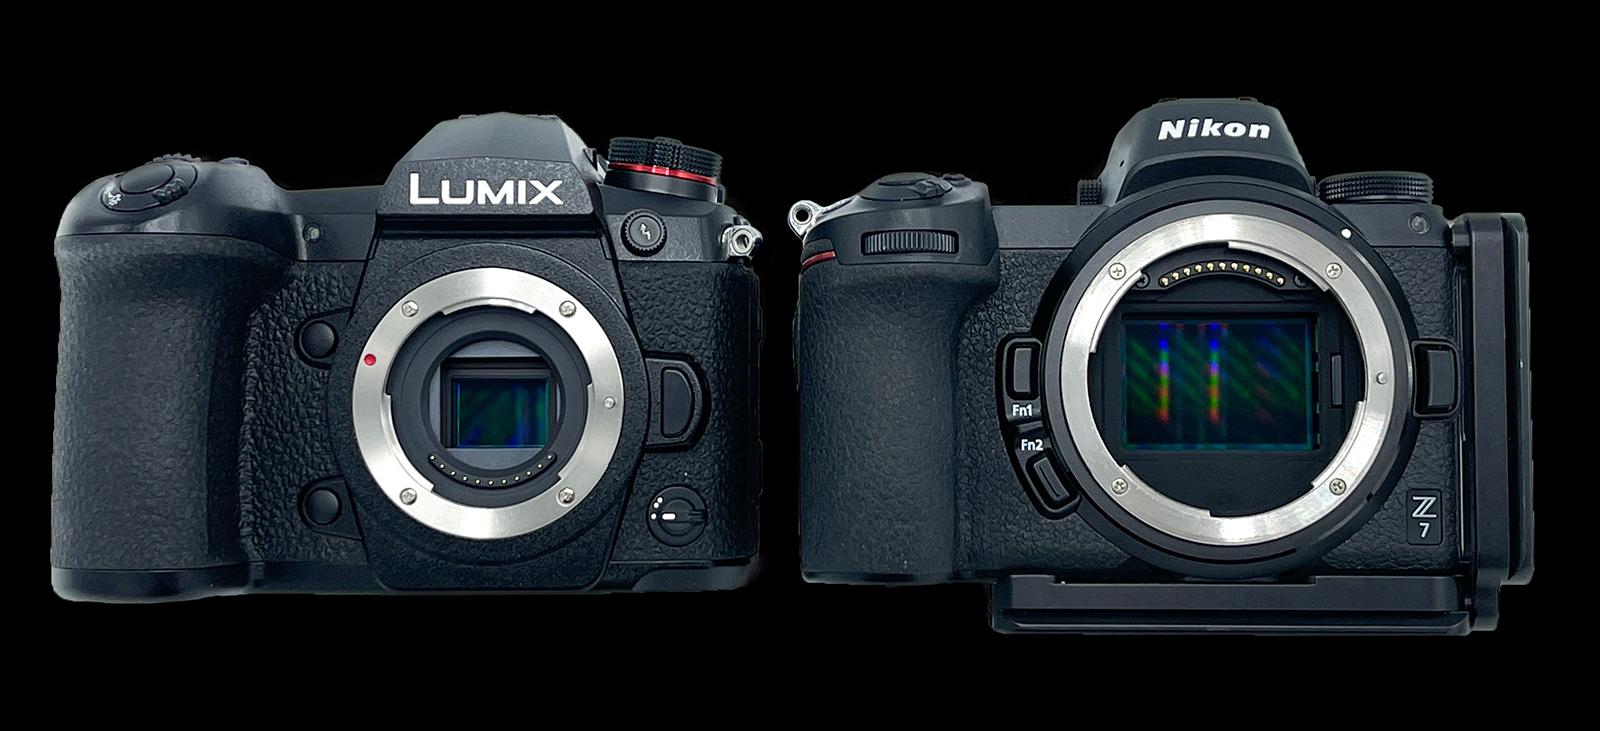 Panasonic Lumix G9 Crop Sensor Vs. Nikon Z7 Full Frame Sensor